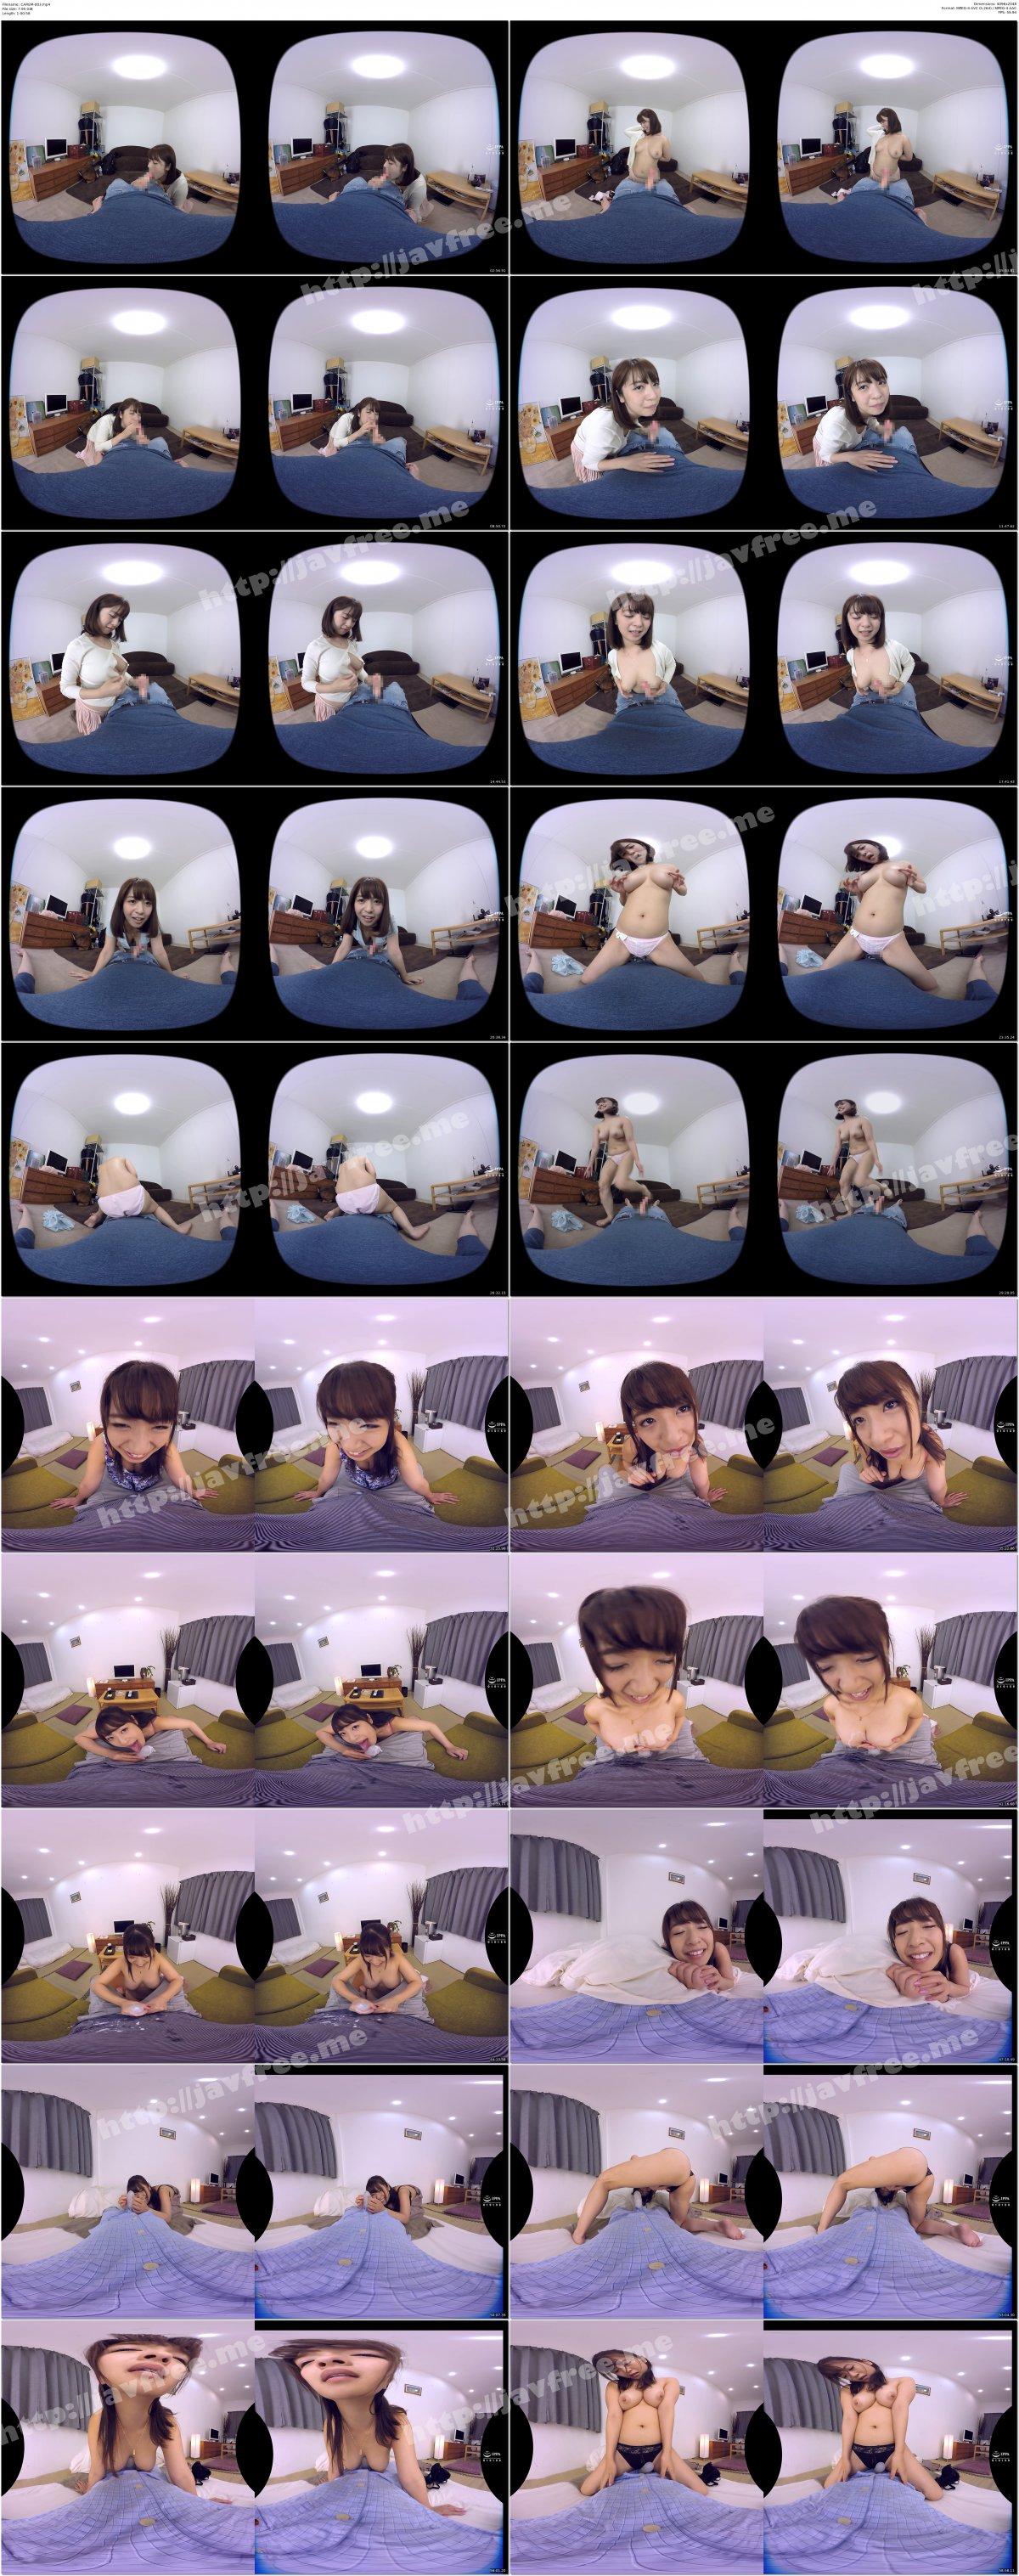 [CAREM-003] 【VR】デジタルリマスターで鮮明に蘇る!VRドチャシコ名作コレクション~尾上若葉